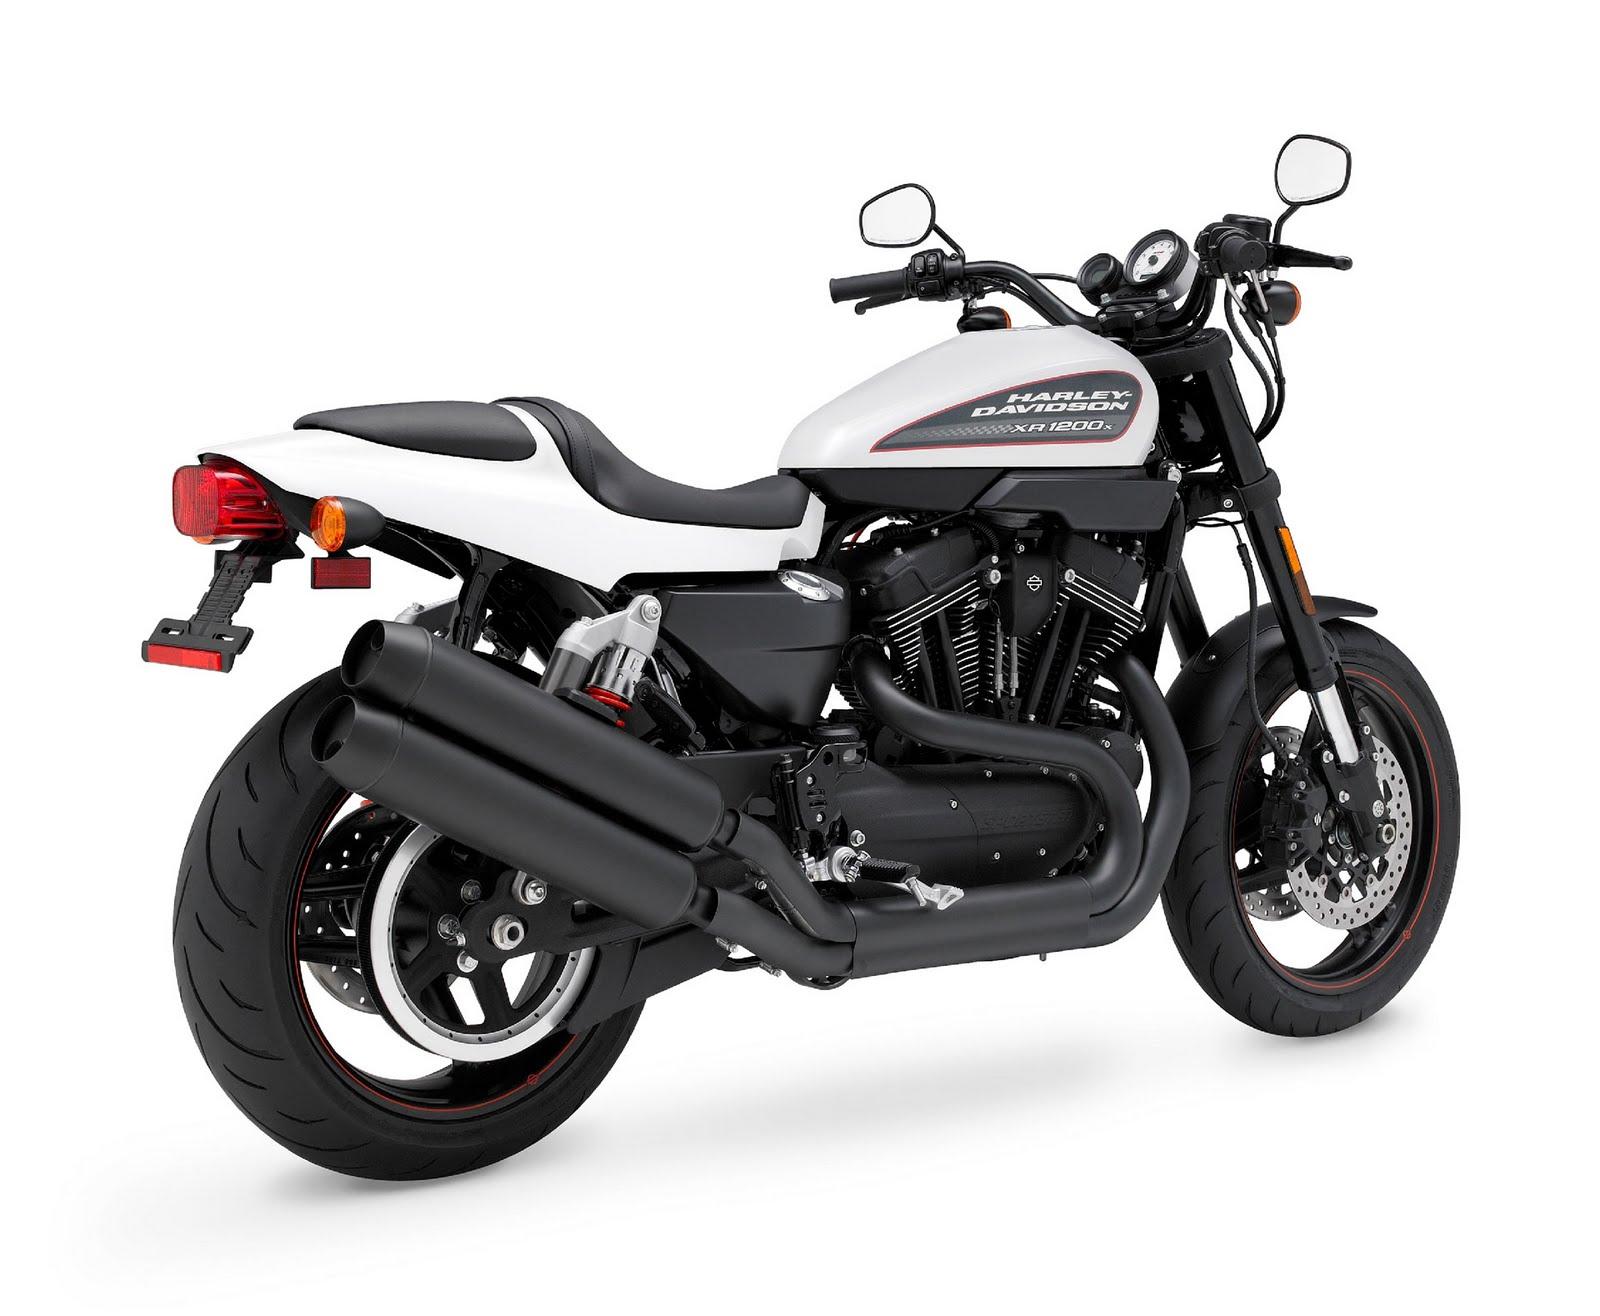 http://3.bp.blogspot.com/_J3_liDBfbvs/TBWtCq8du6I/AAAAAAAAtd0/DLDc3rwHyTE/s1600/2011-Harley-Davidson-XR1200X-Sport-Touring-Bike.jpg